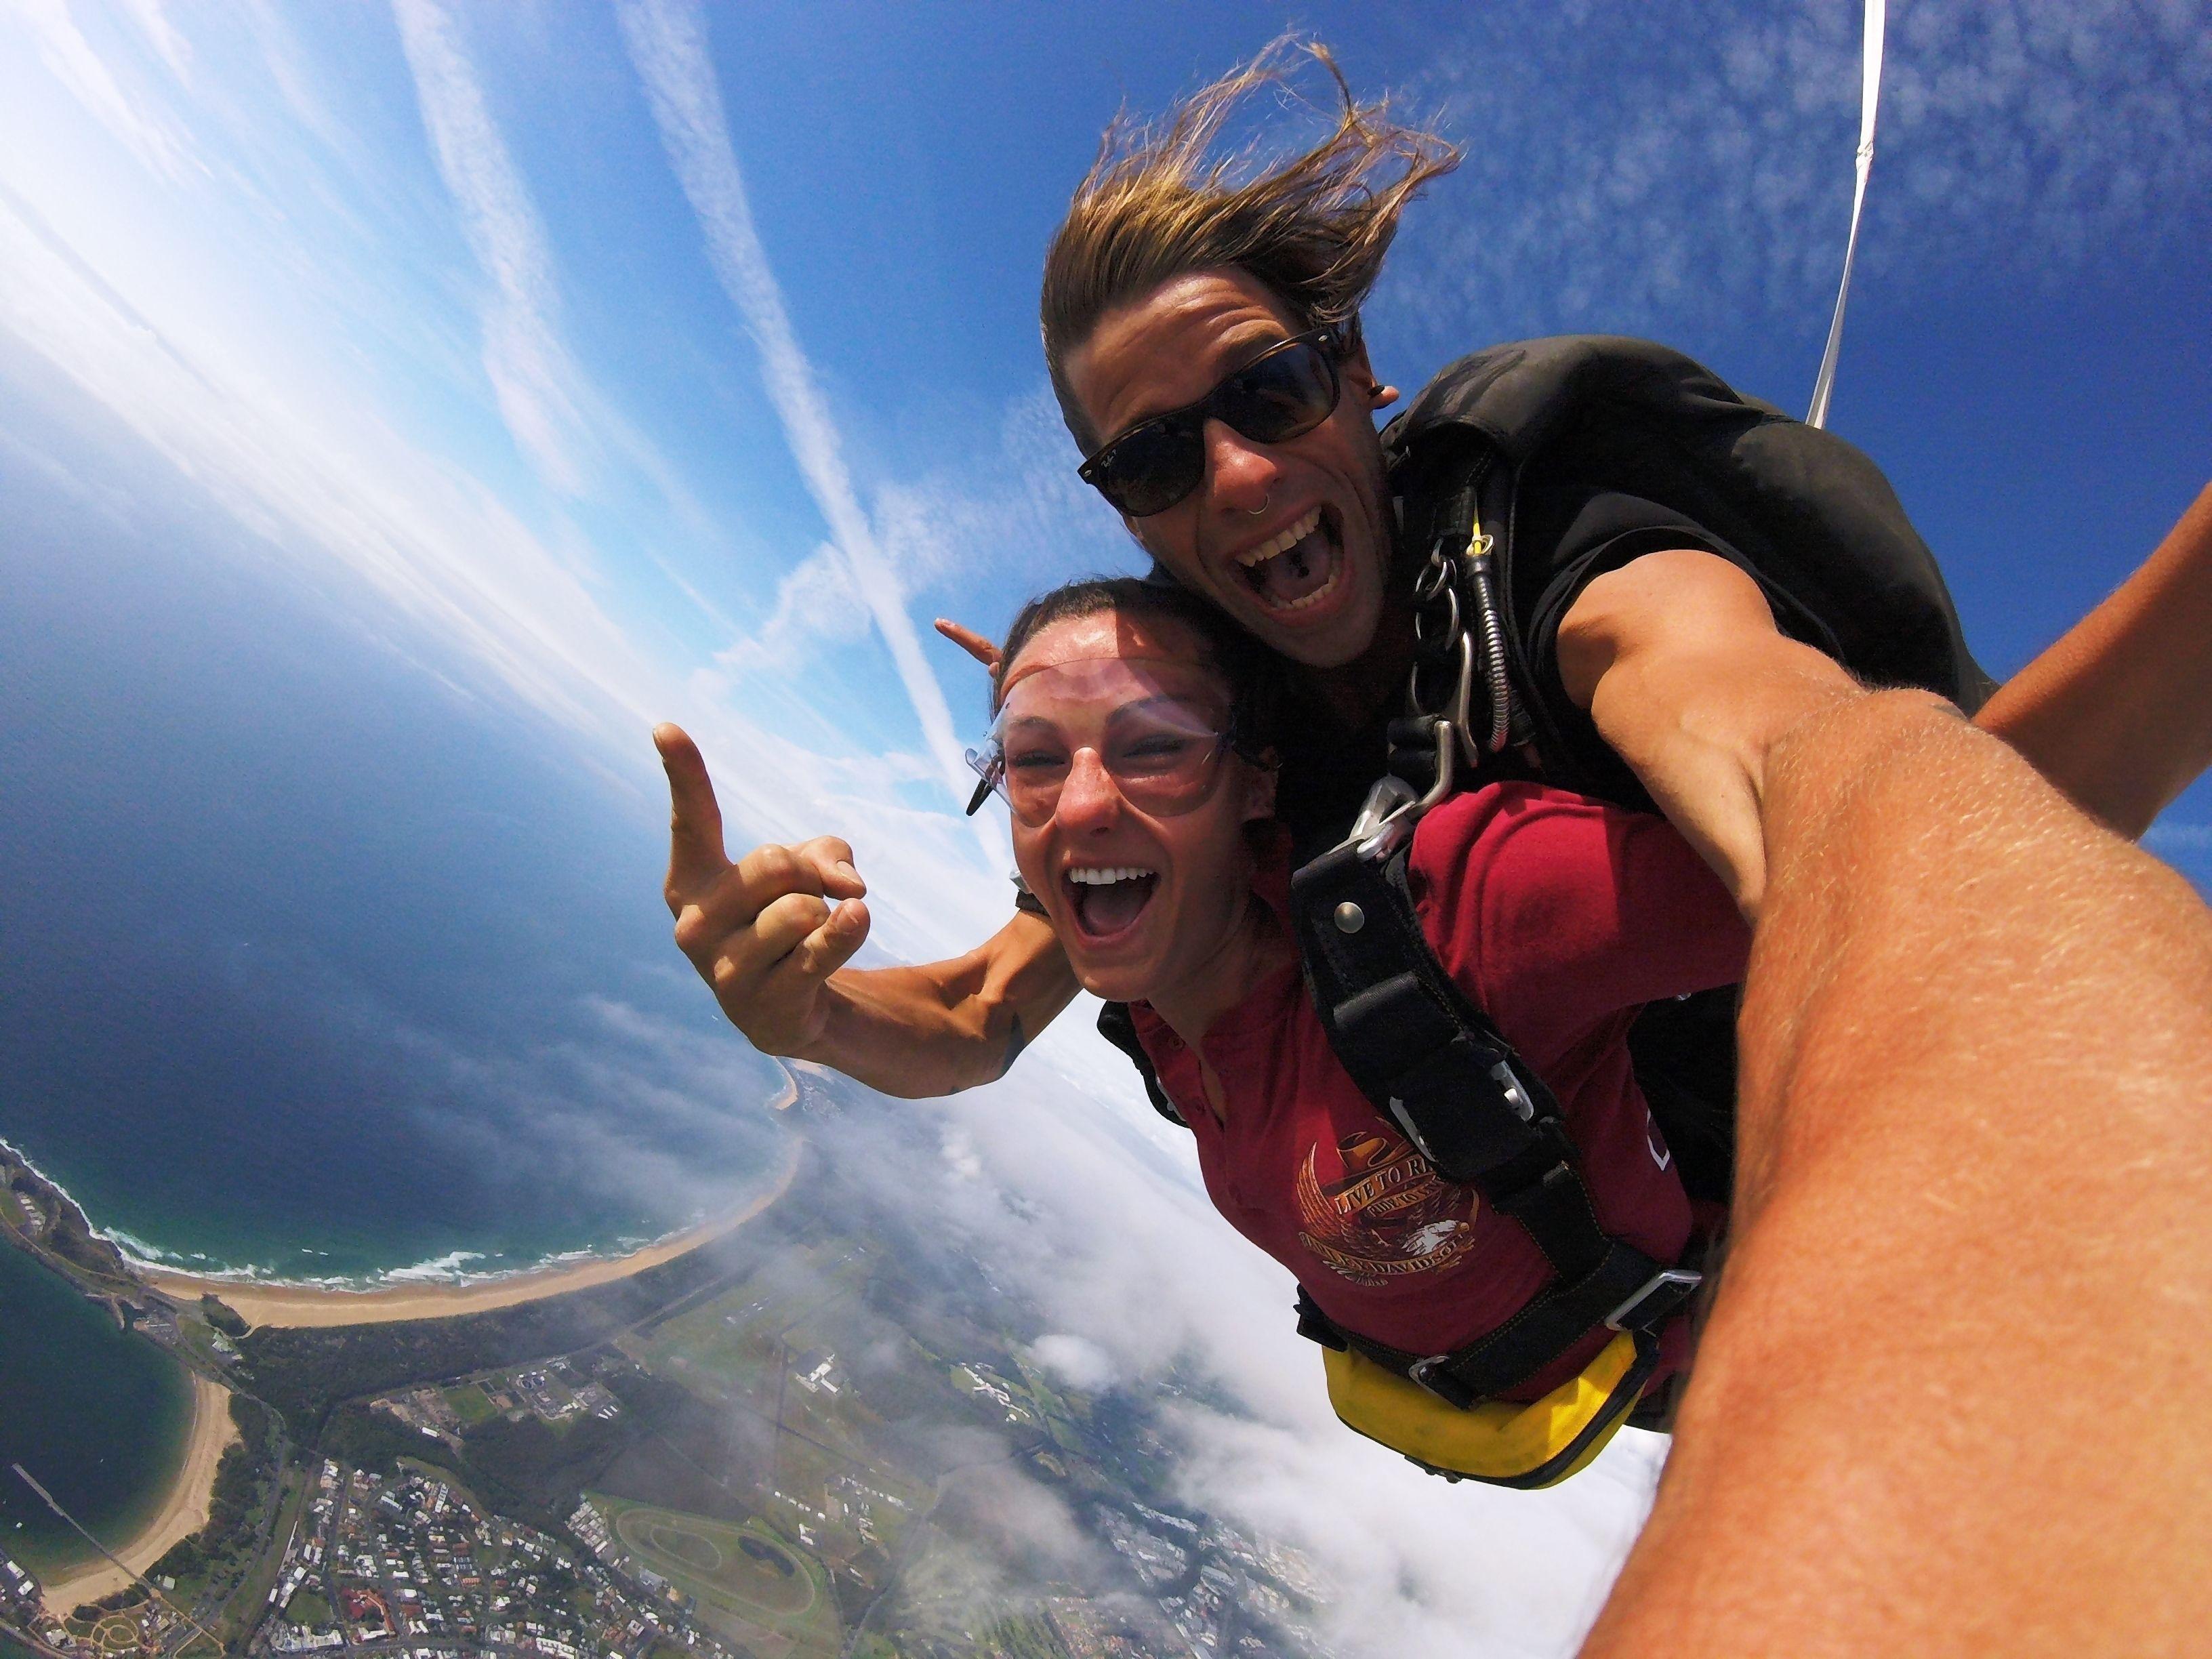 Tandem skydiving in Australia